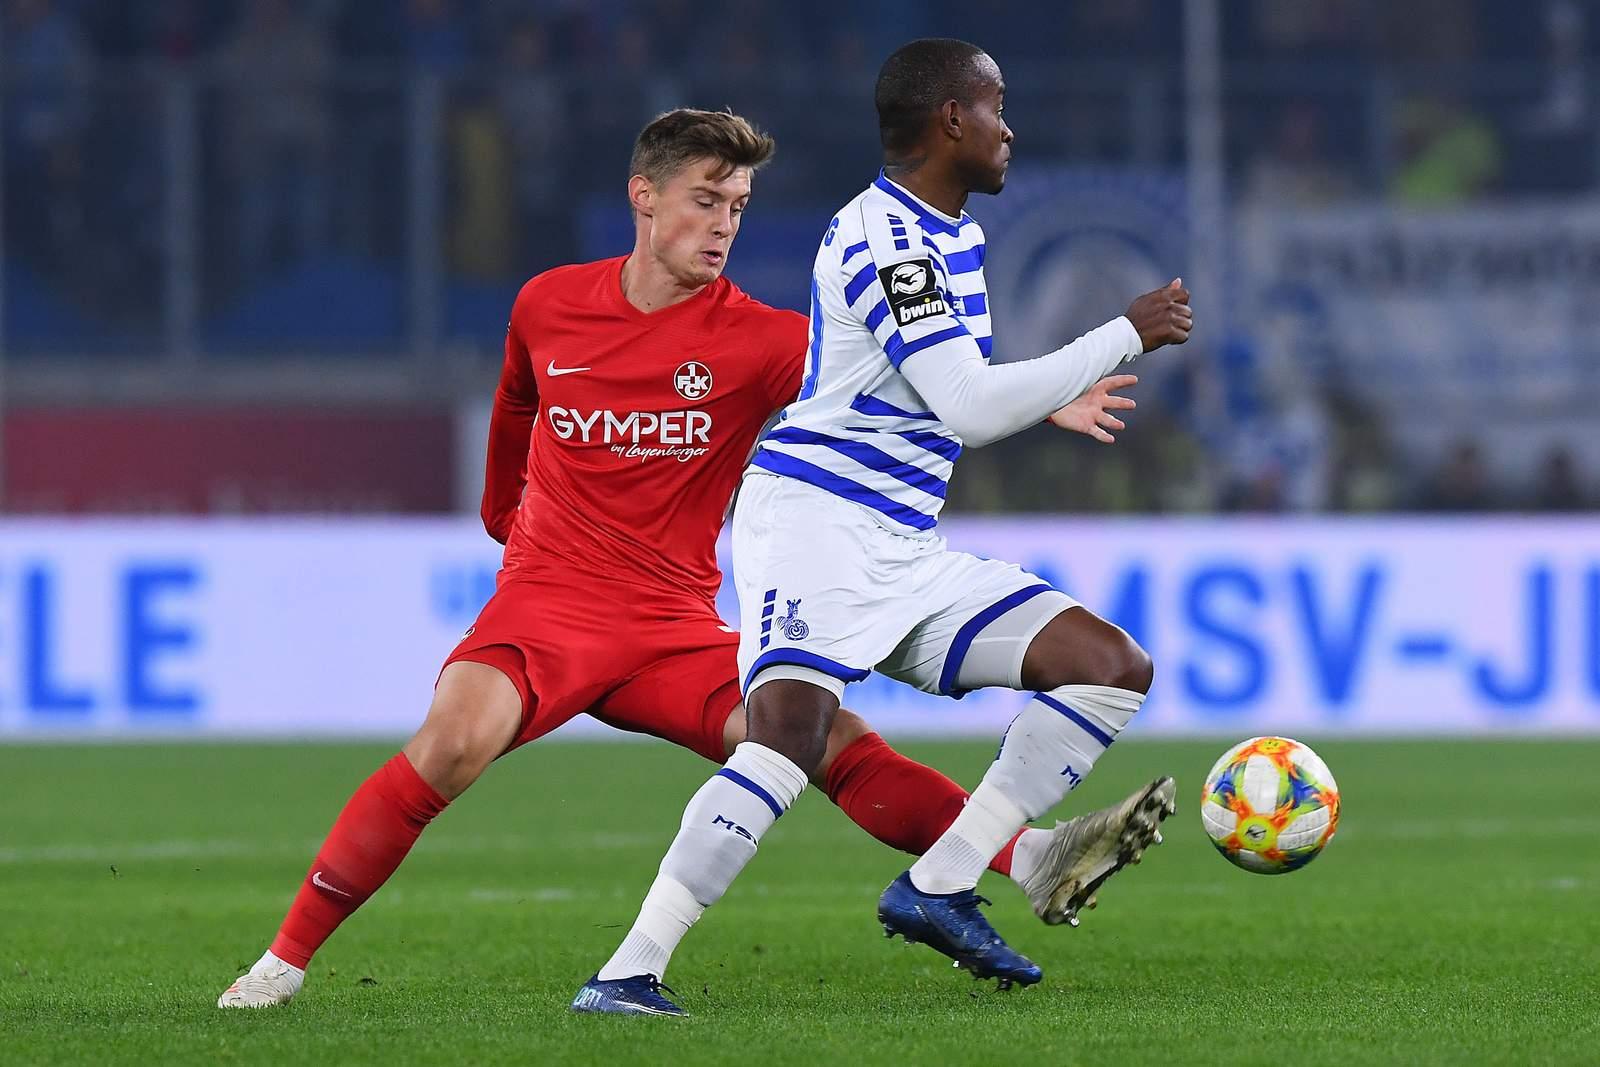 Kaiserslauterns Dominik Schad (l.) gegen Duisburgs Leroy-Jacques Mickels.